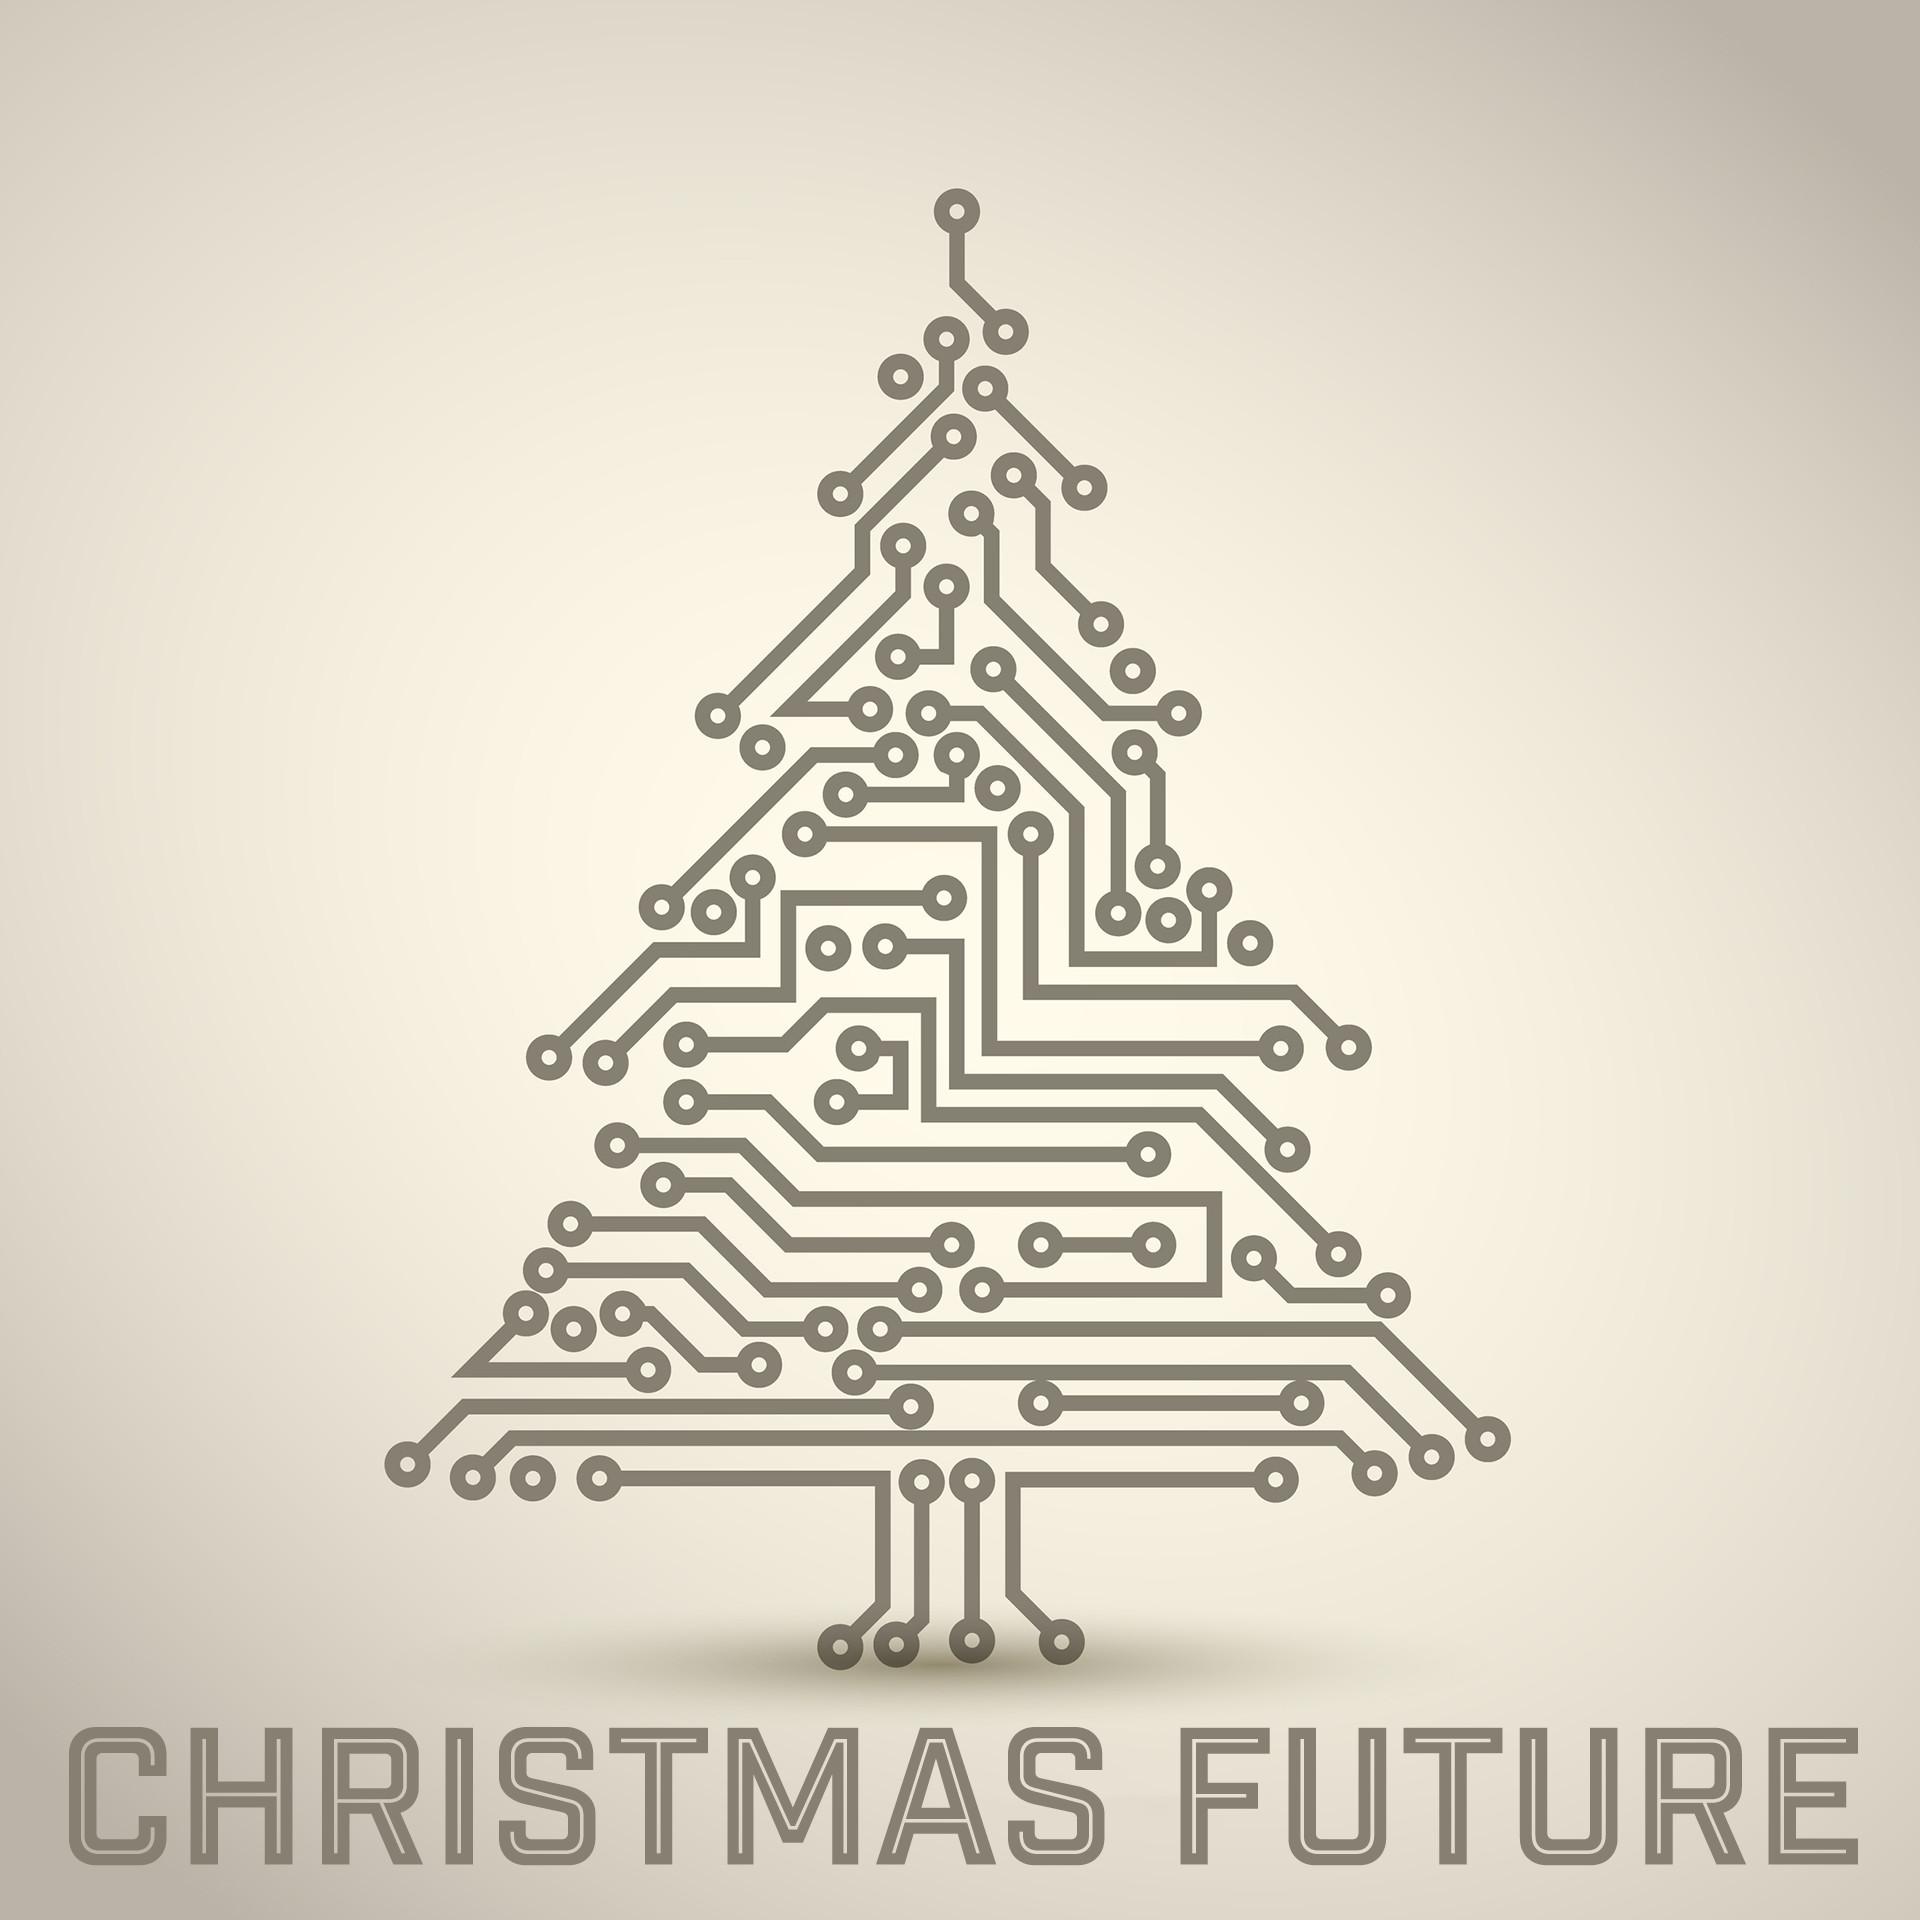 christmas future script the skit guys - Christmas Skits For Youth